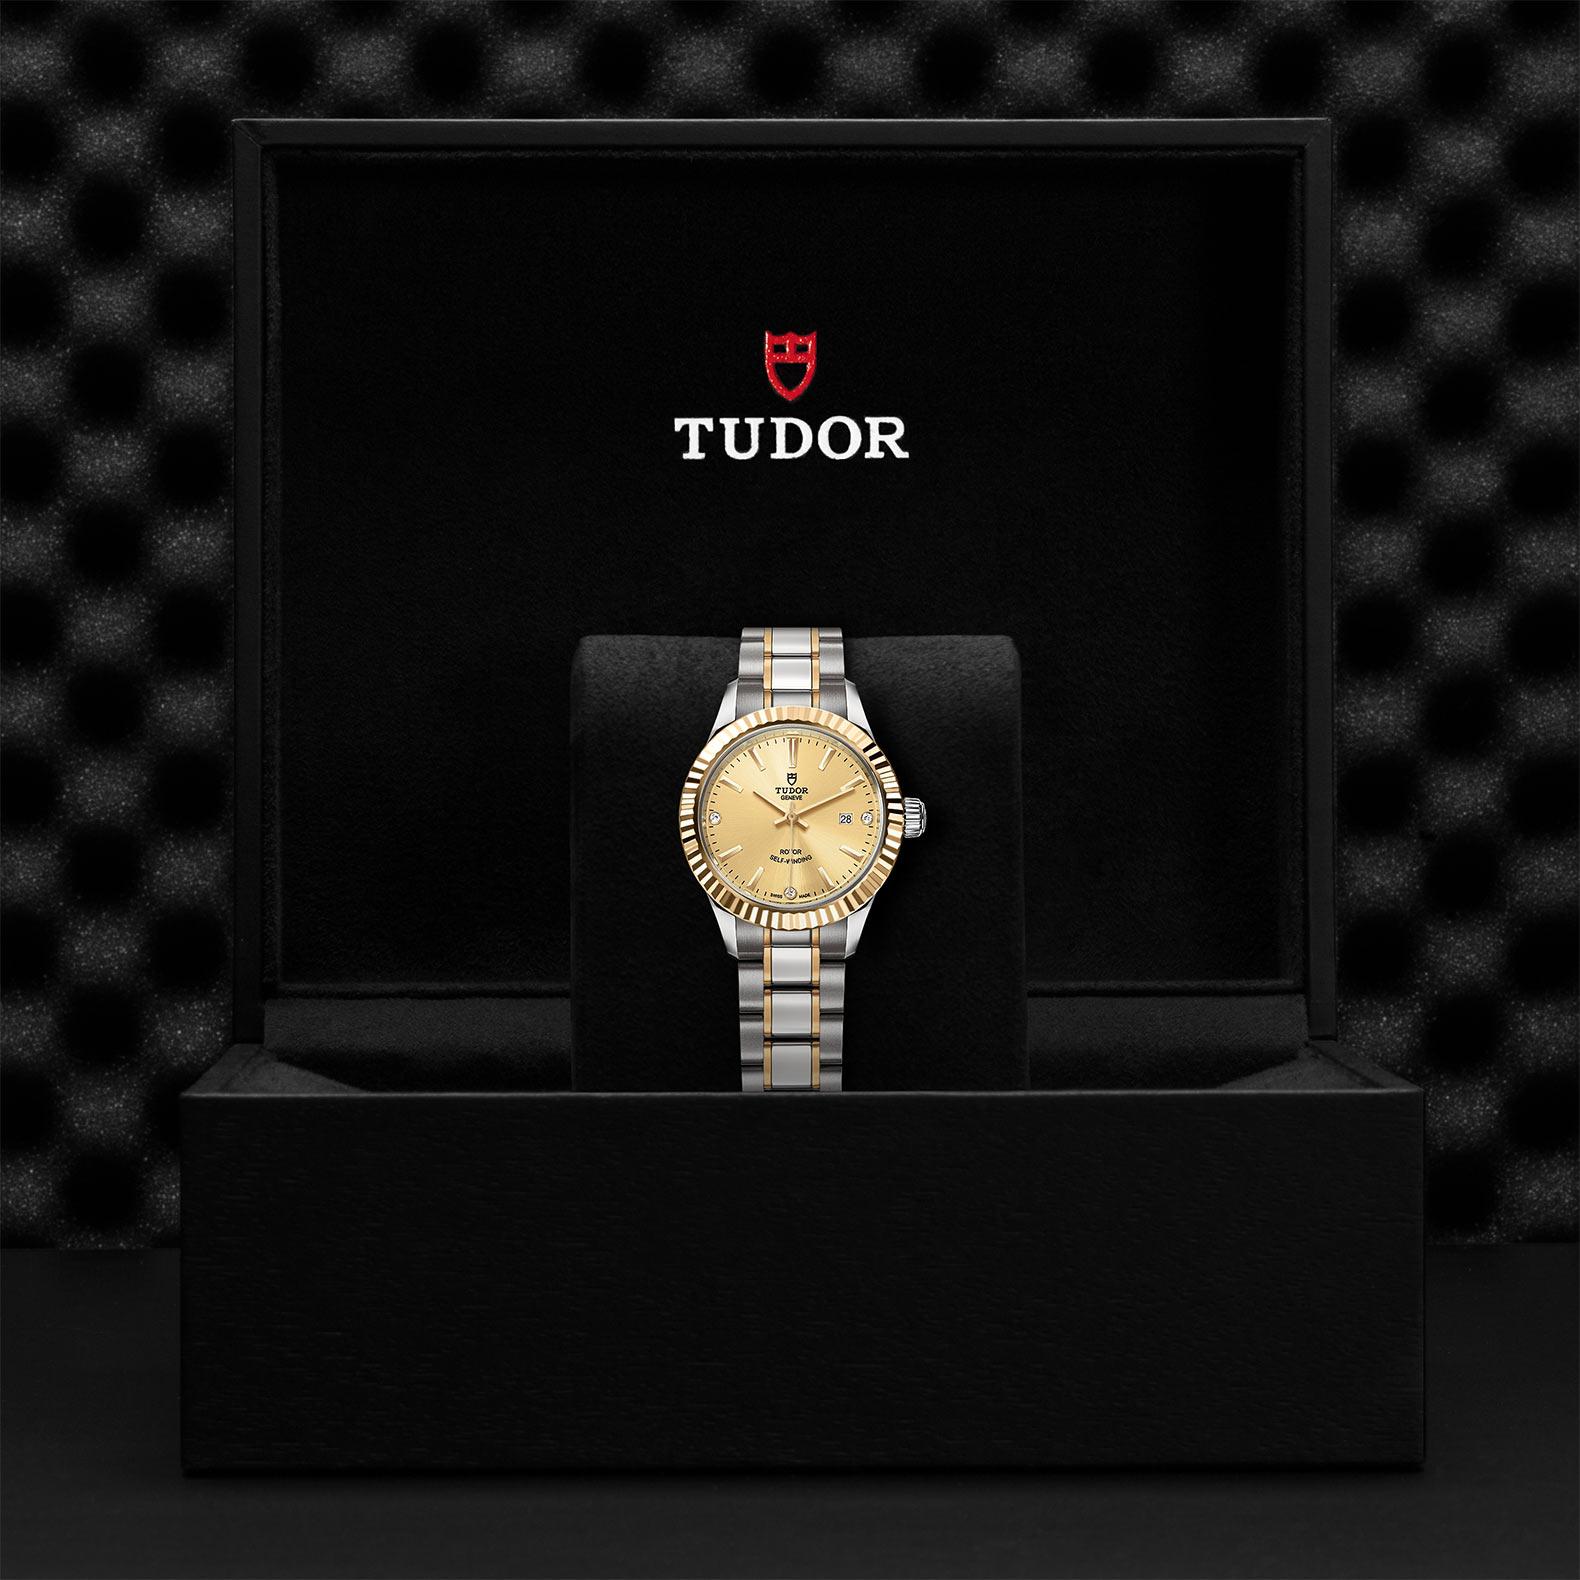 TUDOR Style M12113 0007 Presentation